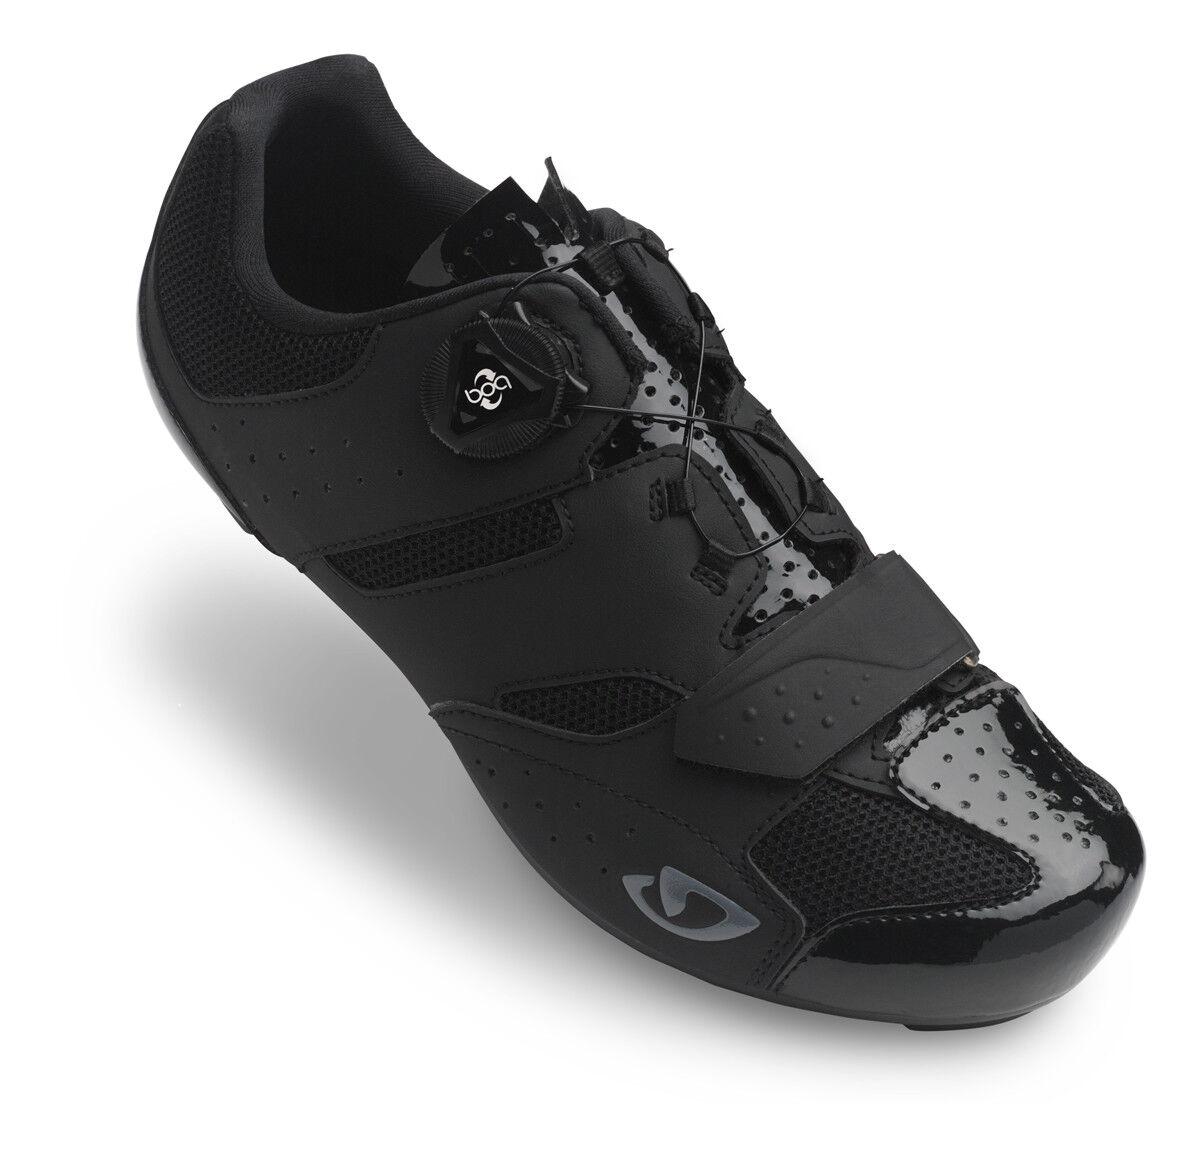 Giro savix bicicleta bicicleta zapatos negro 2019